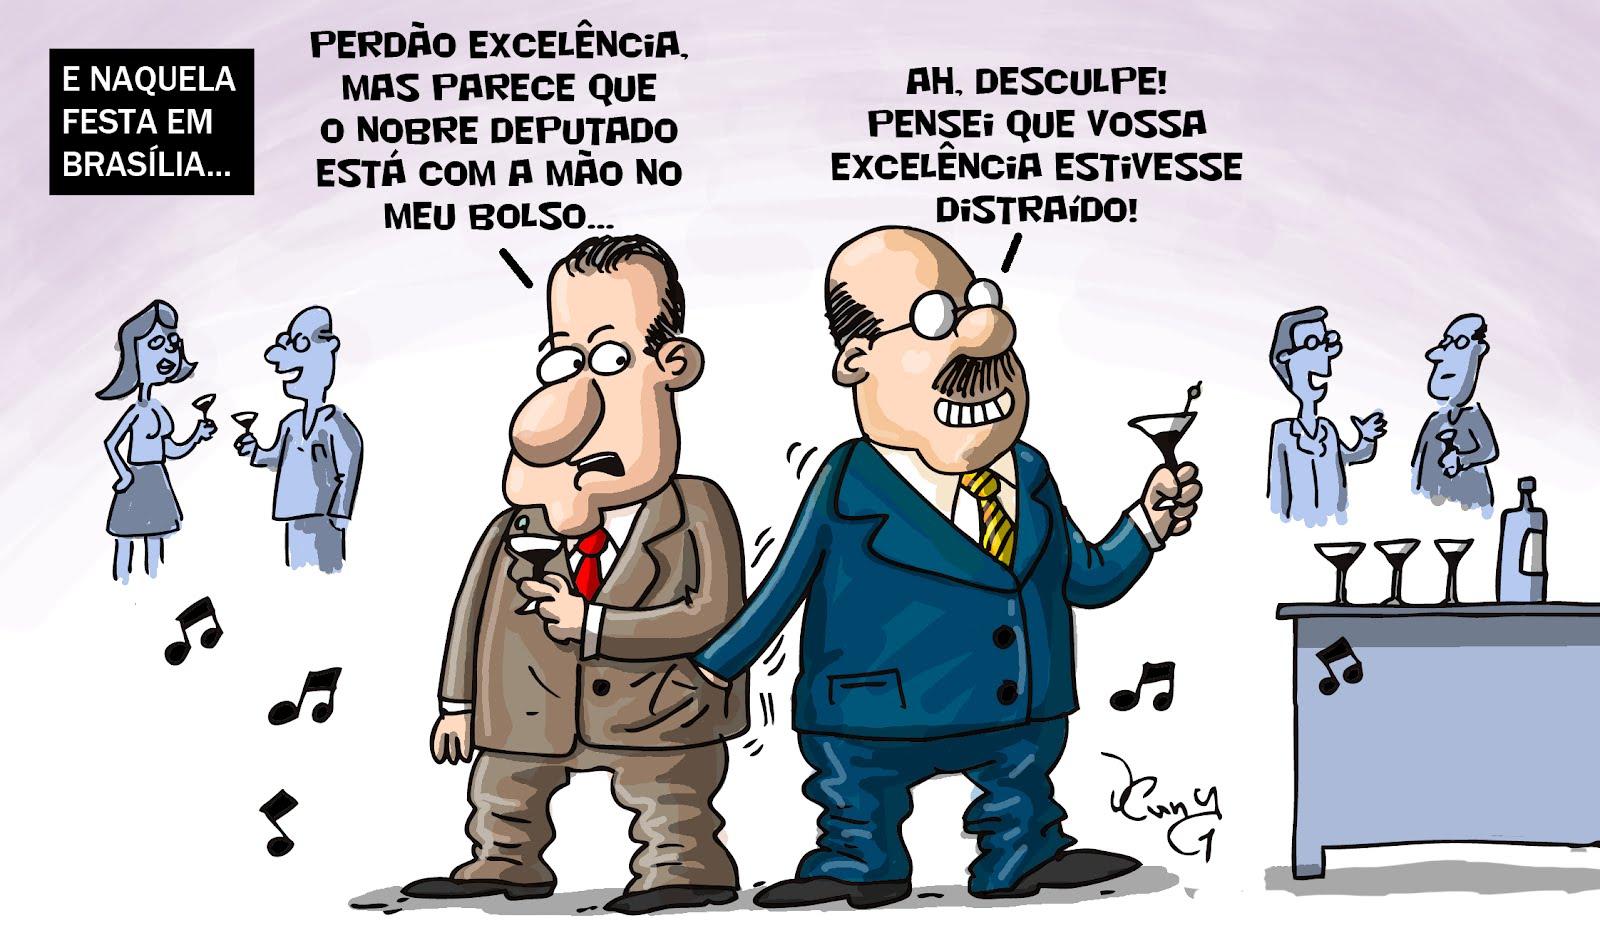 Charge: blog.cruzeirodosul.edu.br